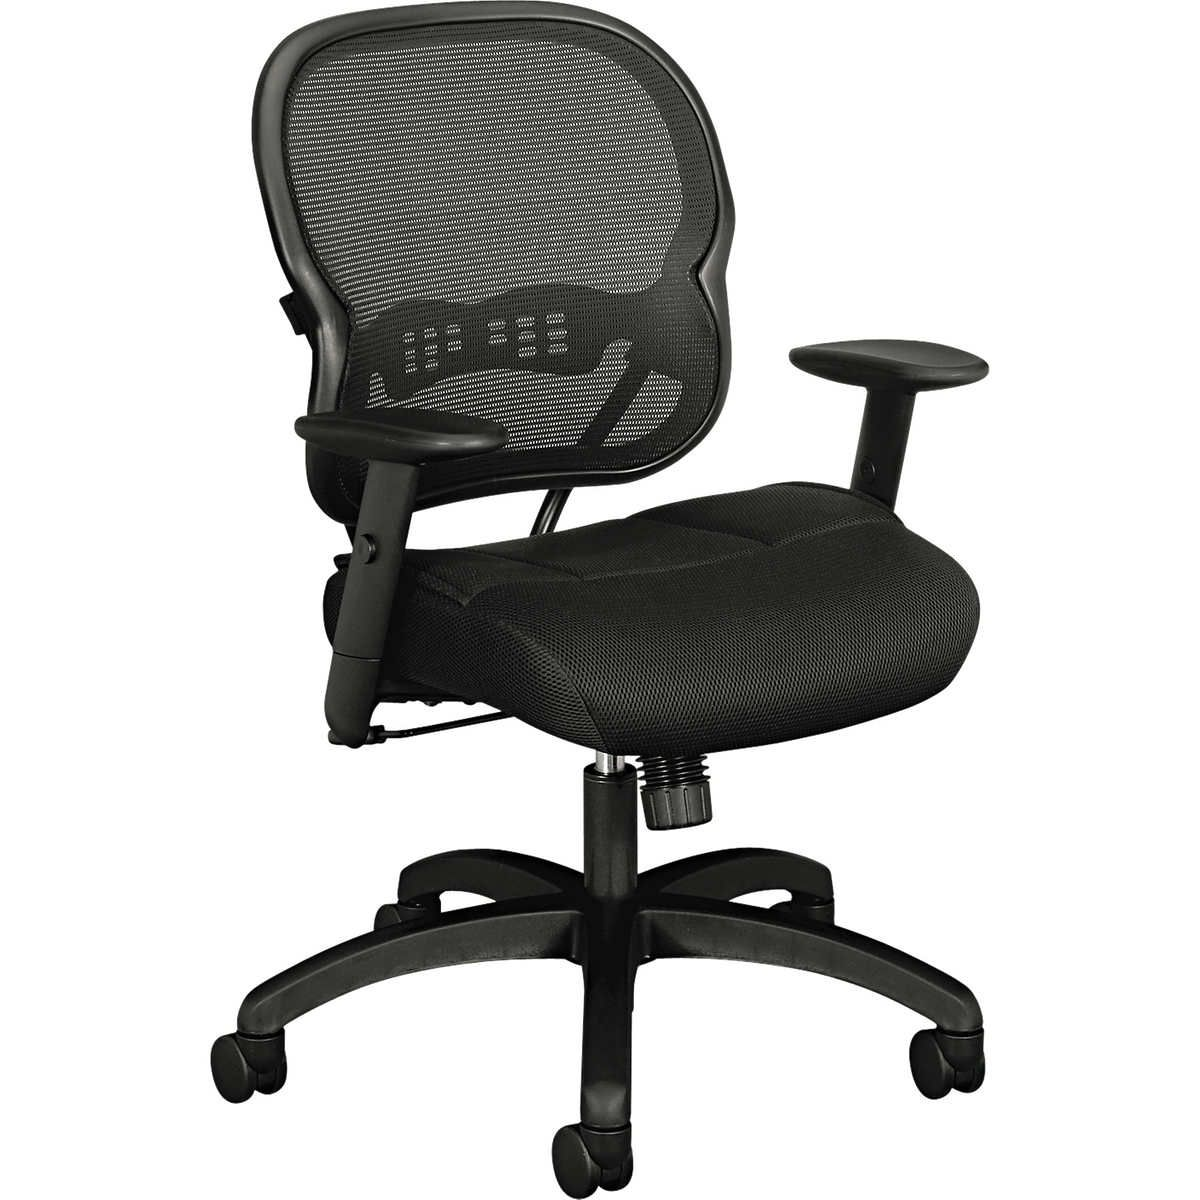 Hon vl700 series black mesh swiveltilt midback chair